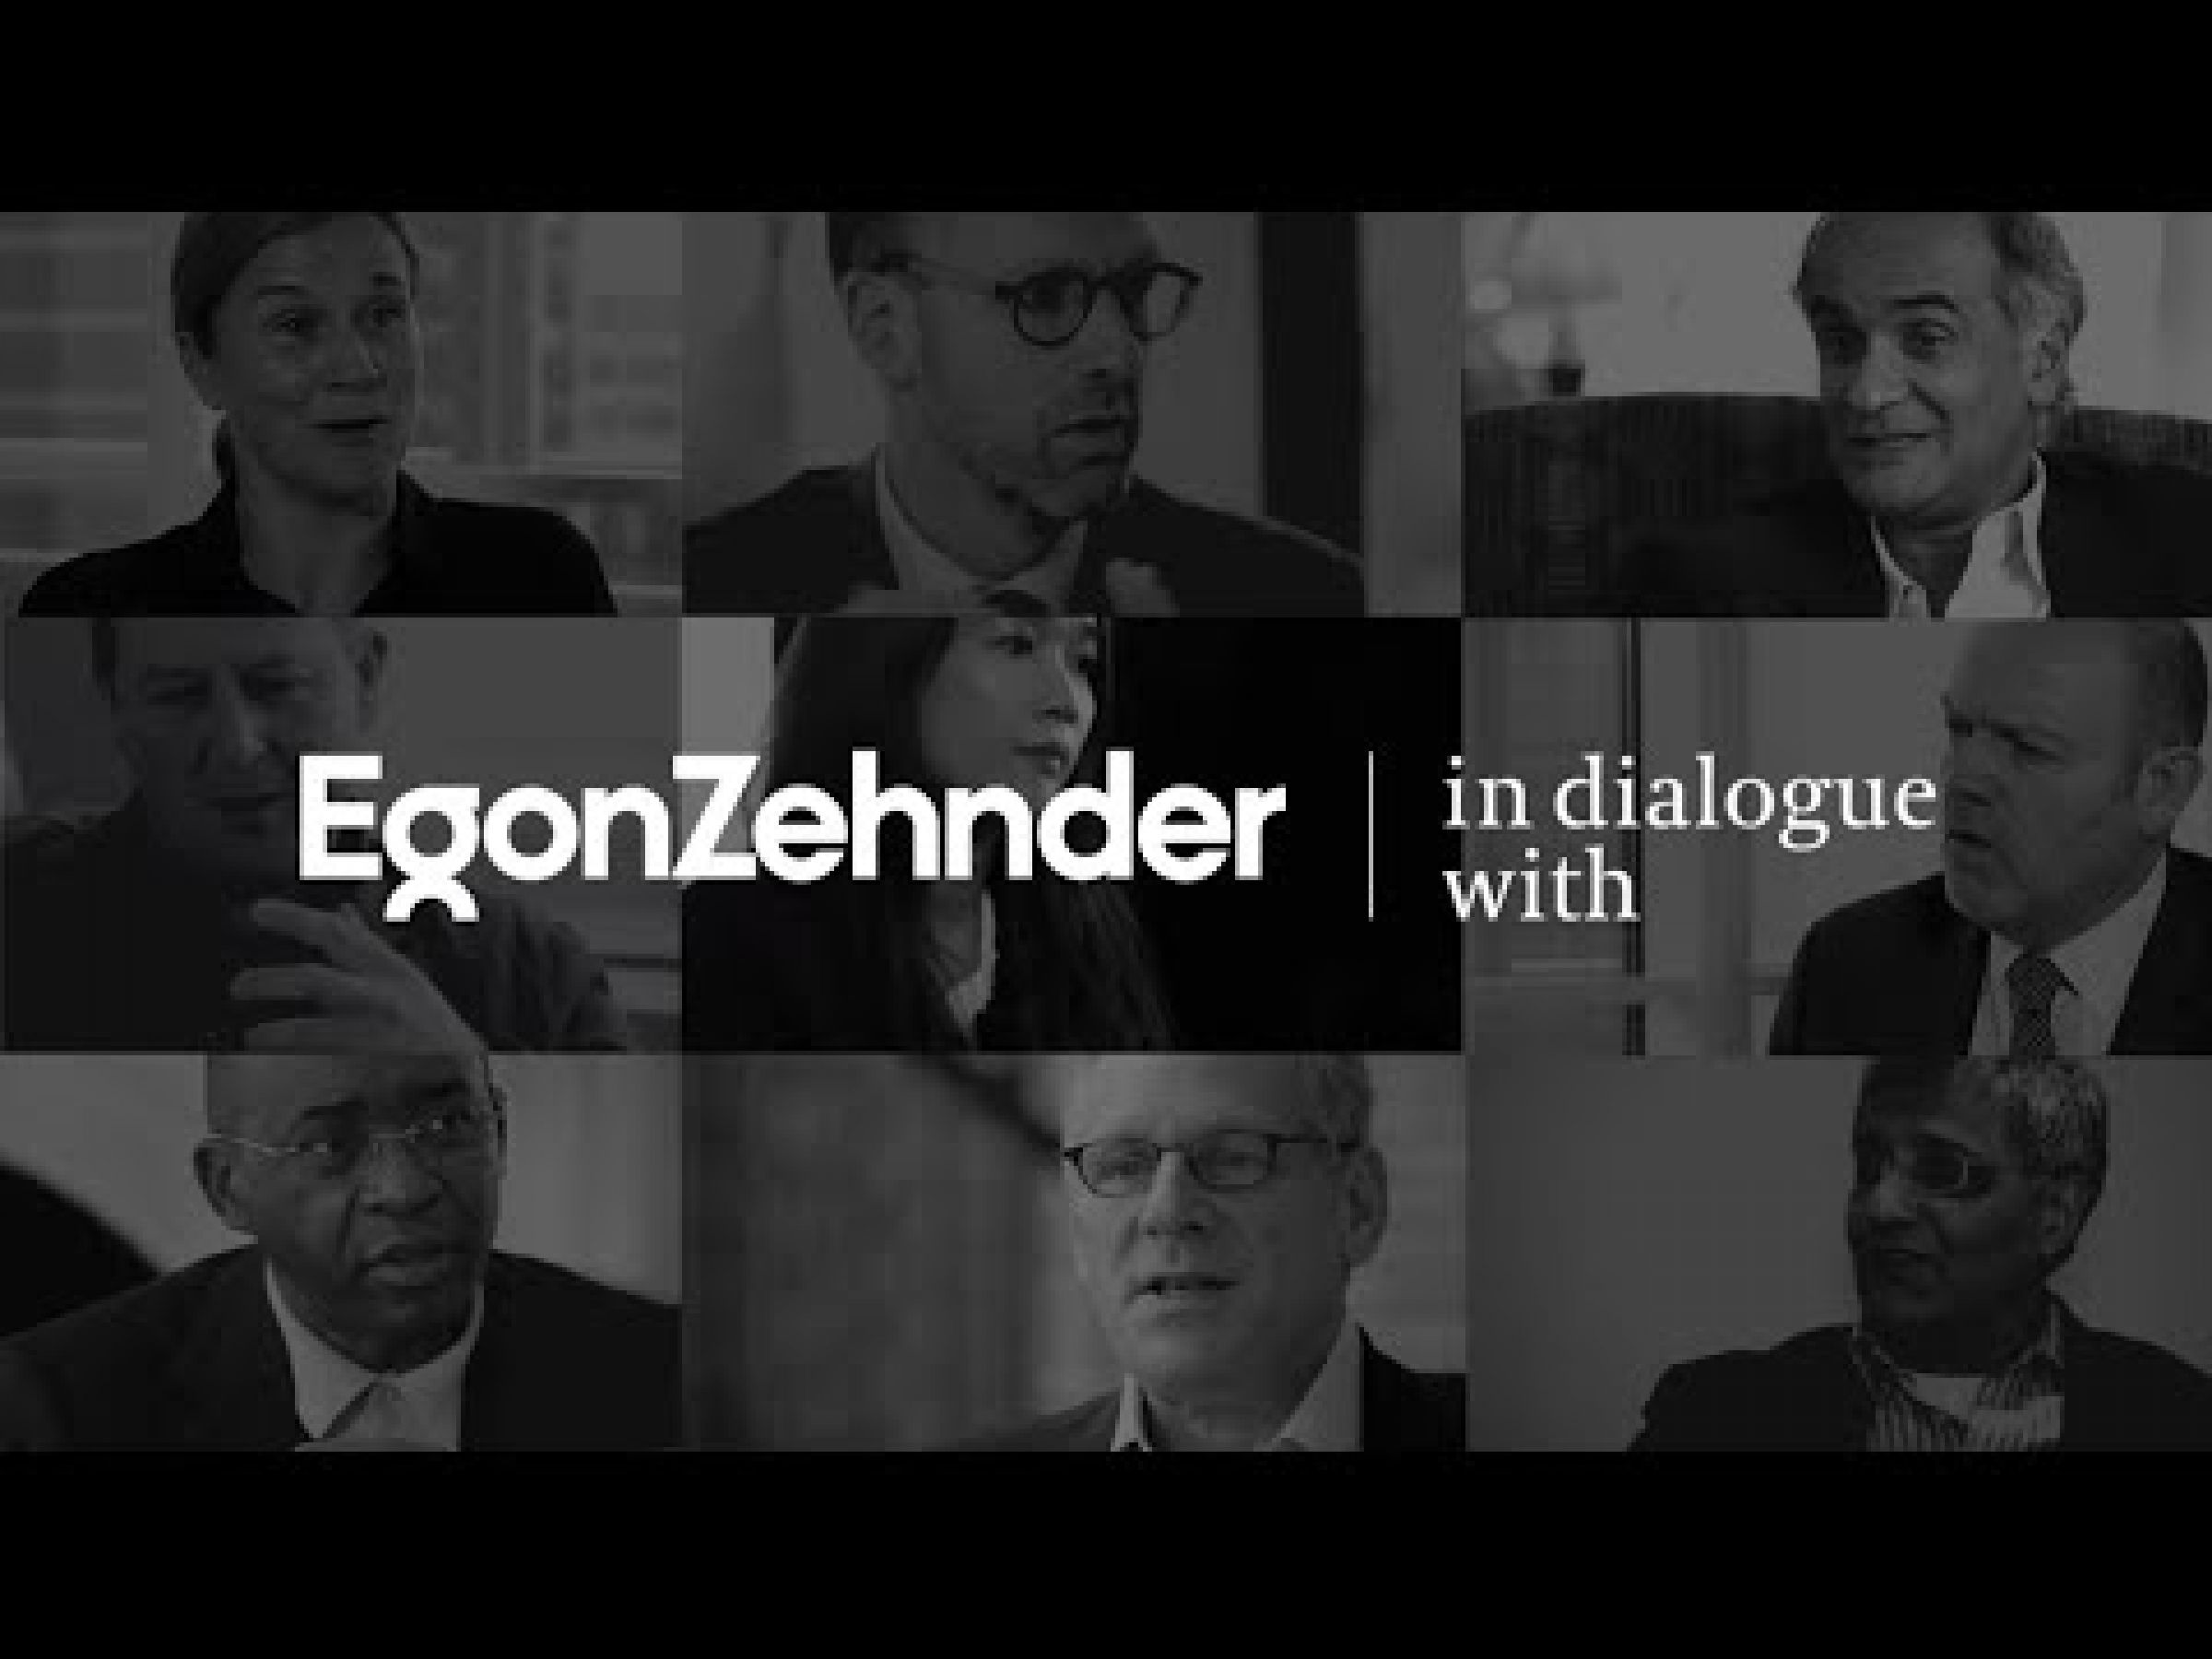 Identity Matters in Leadership